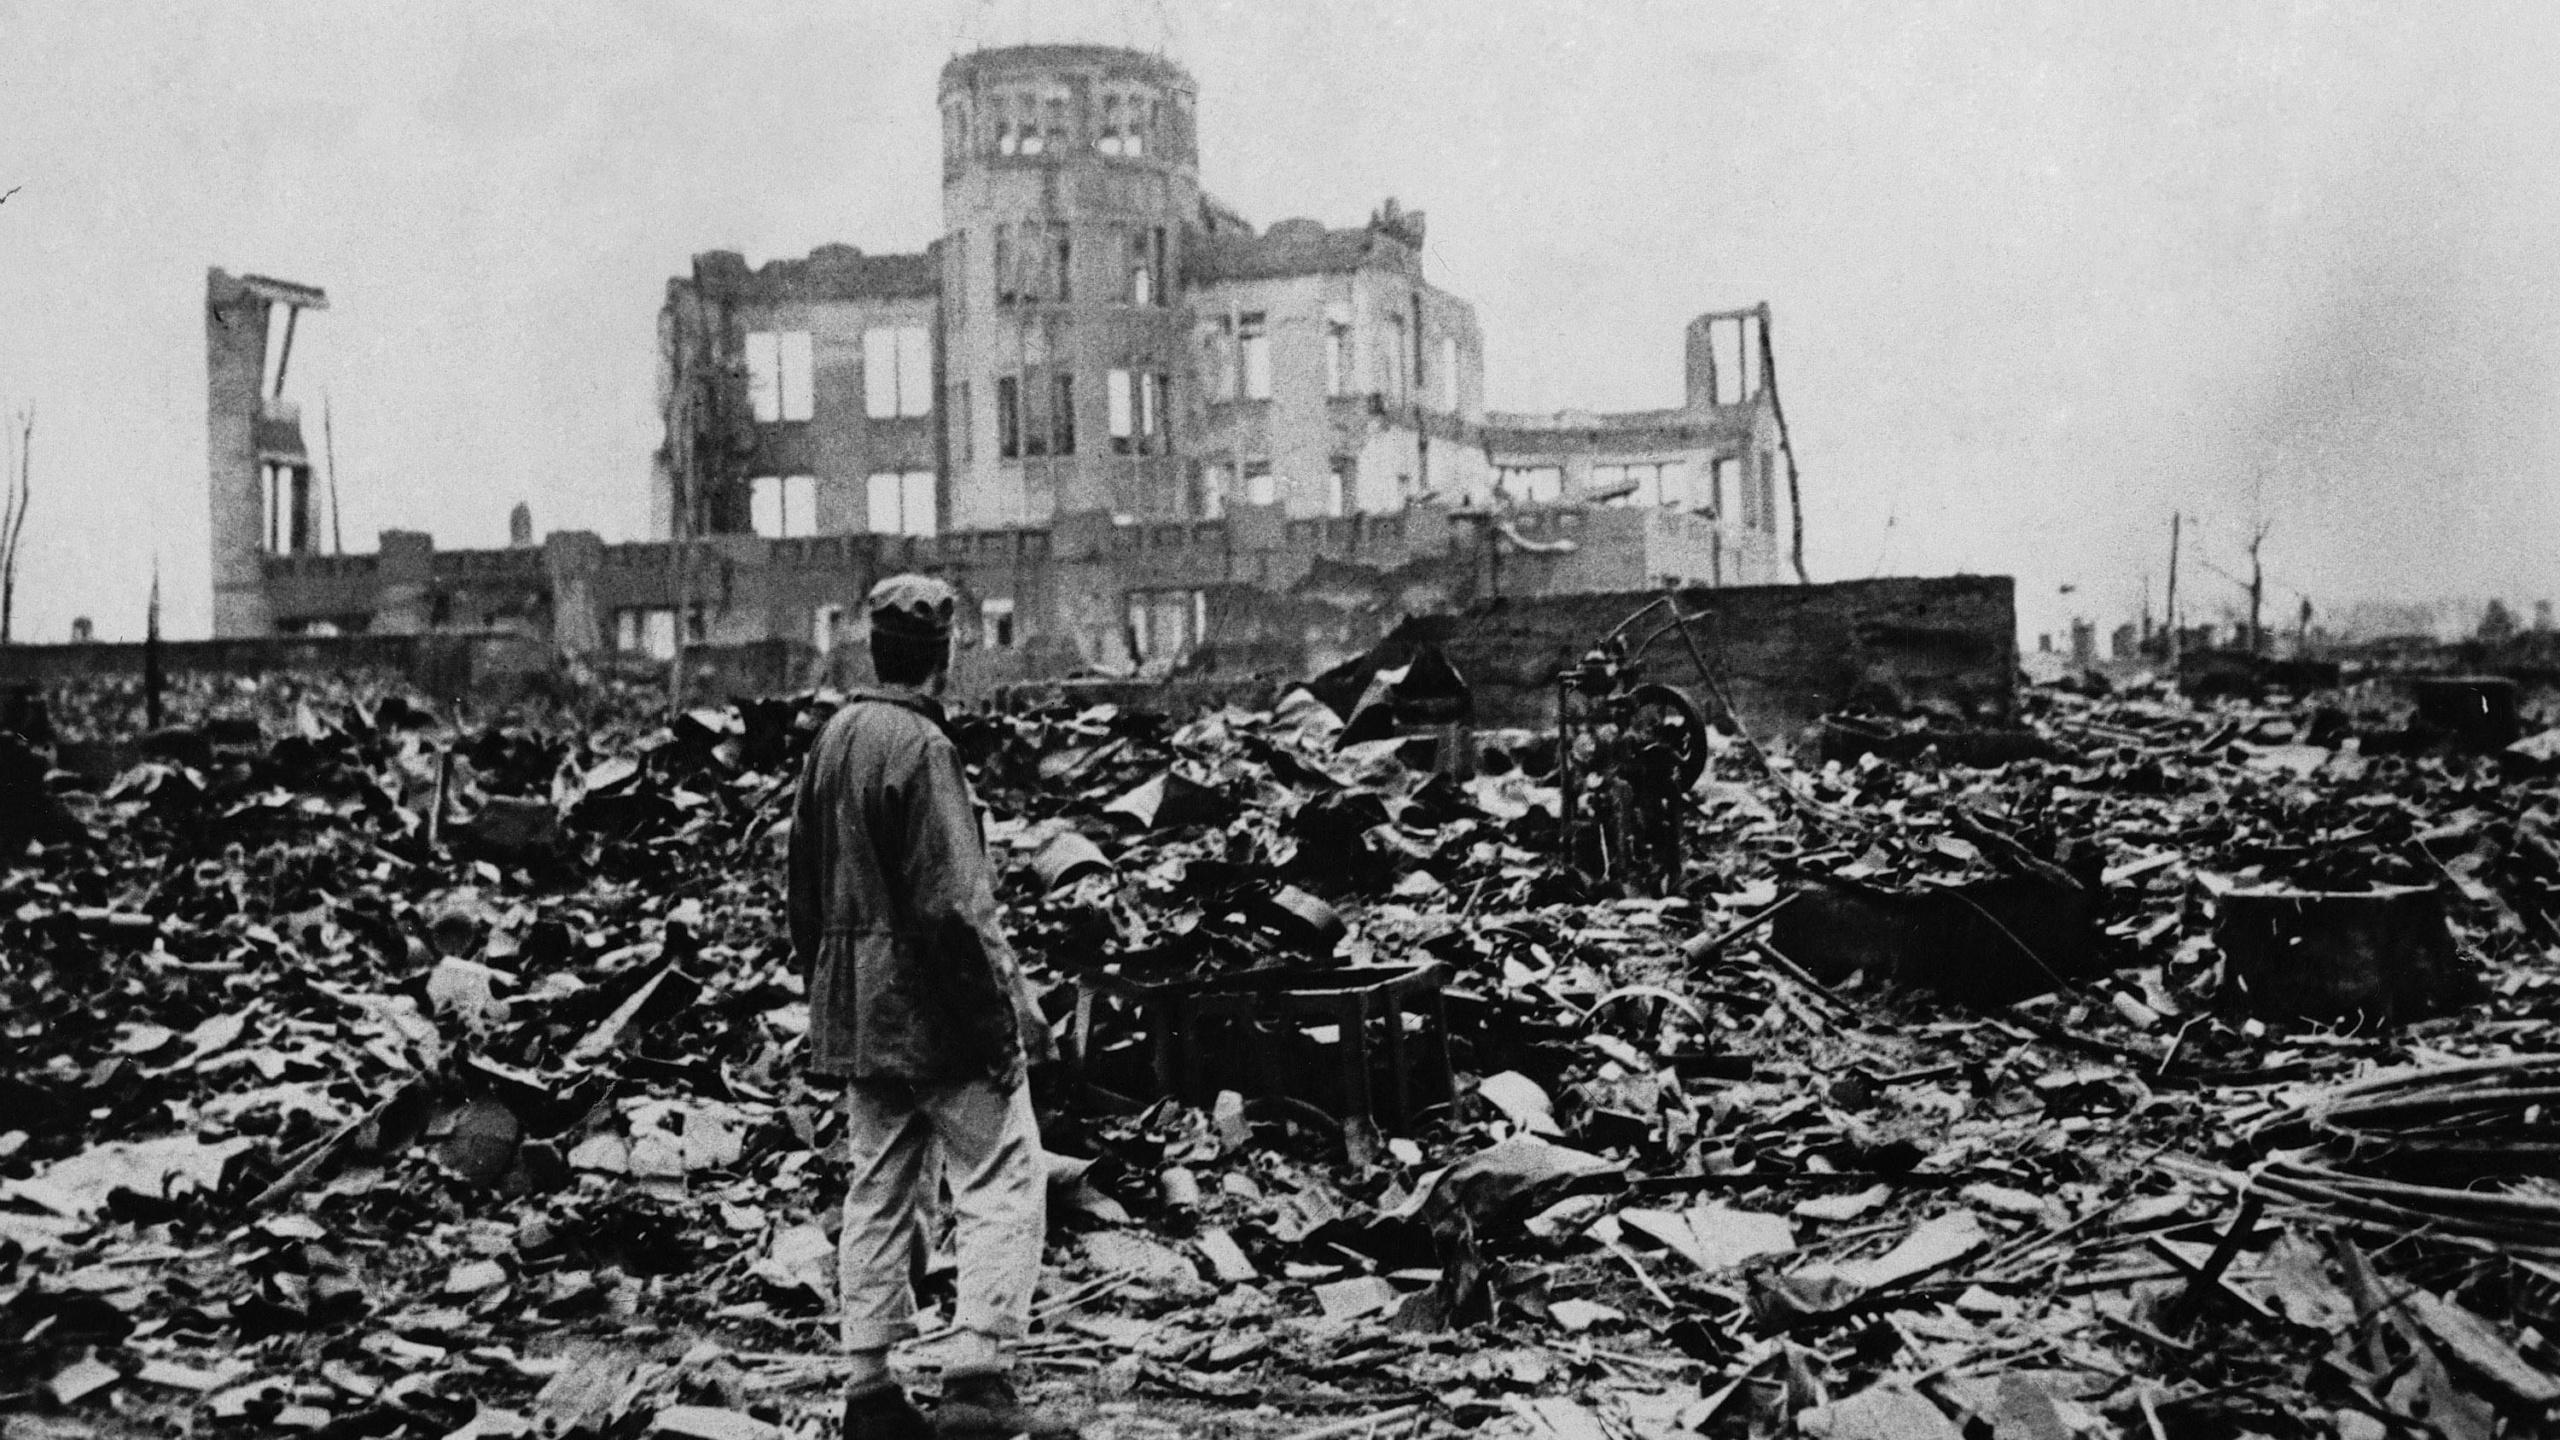 Хиросима: жизнь после